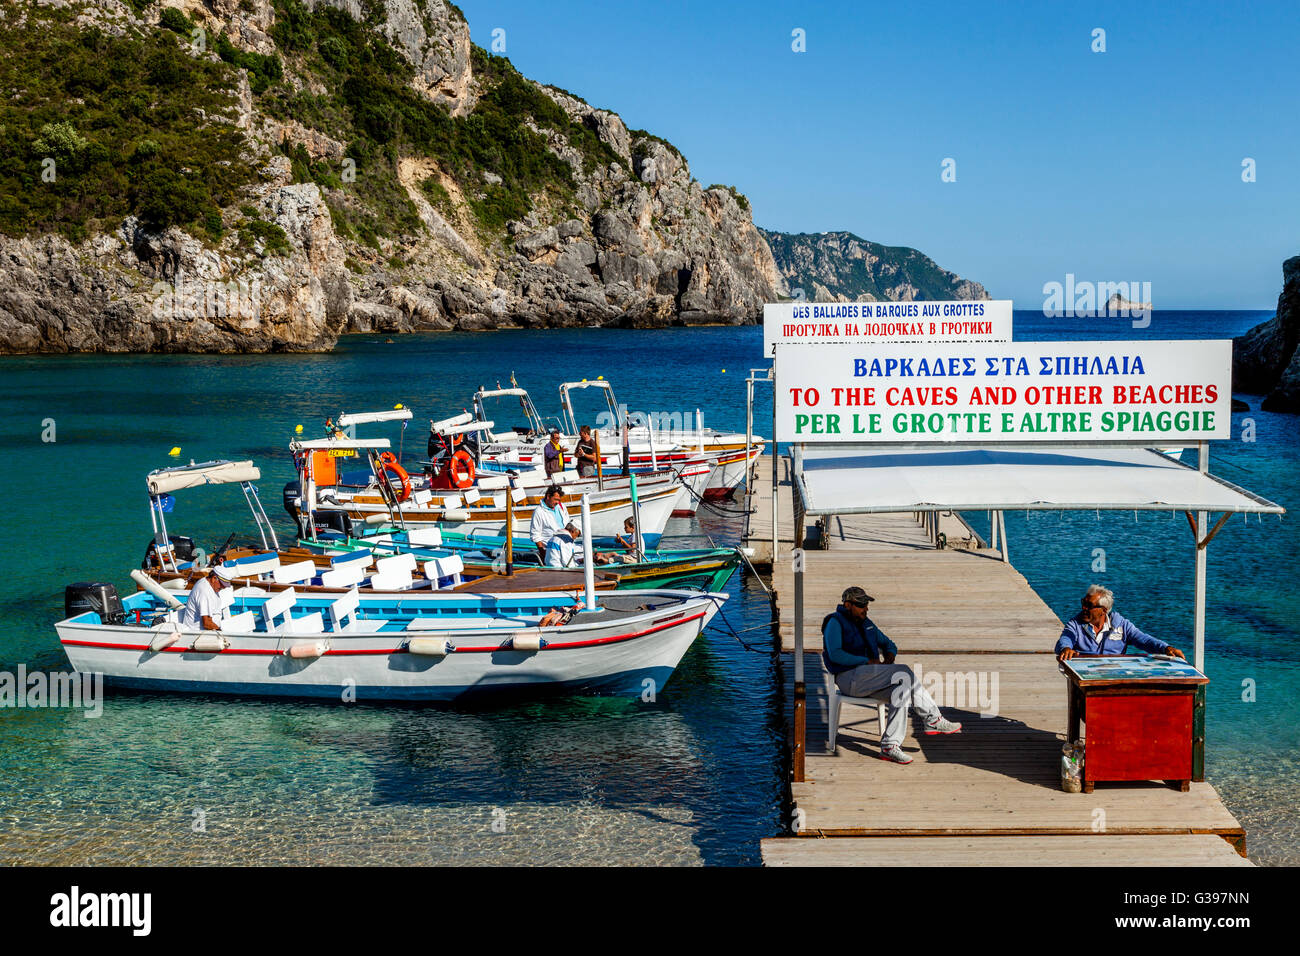 Local Boat Captains Waiting For Business, Paleokastritsa, Corfu Island, Greece - Stock Image